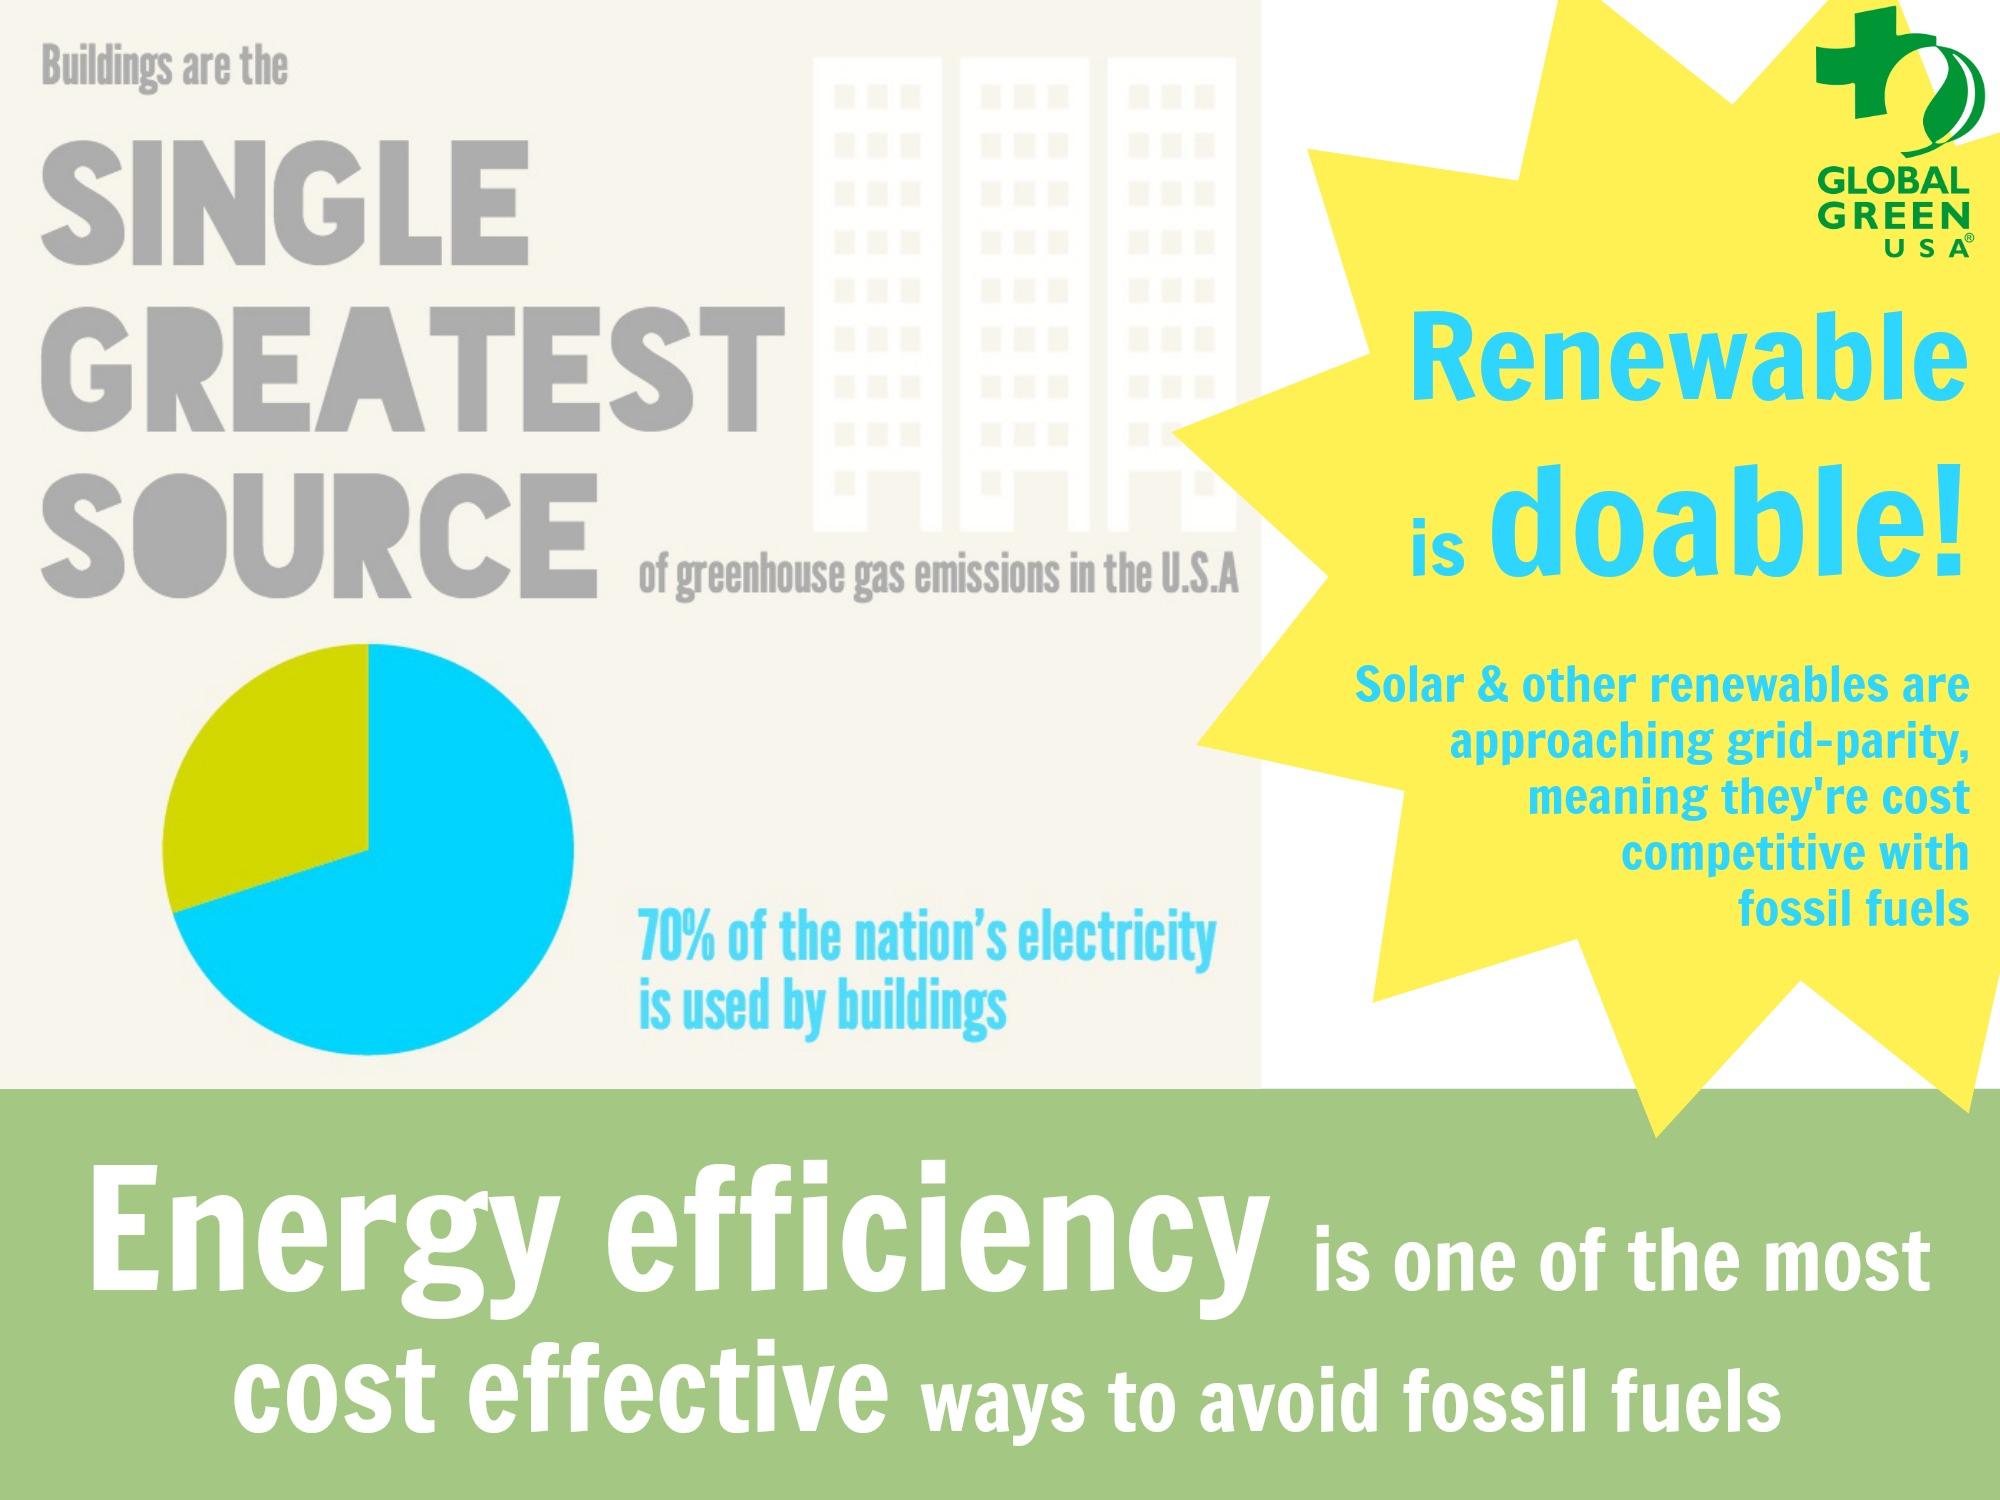 Global Green Renewable Energy Efficiency